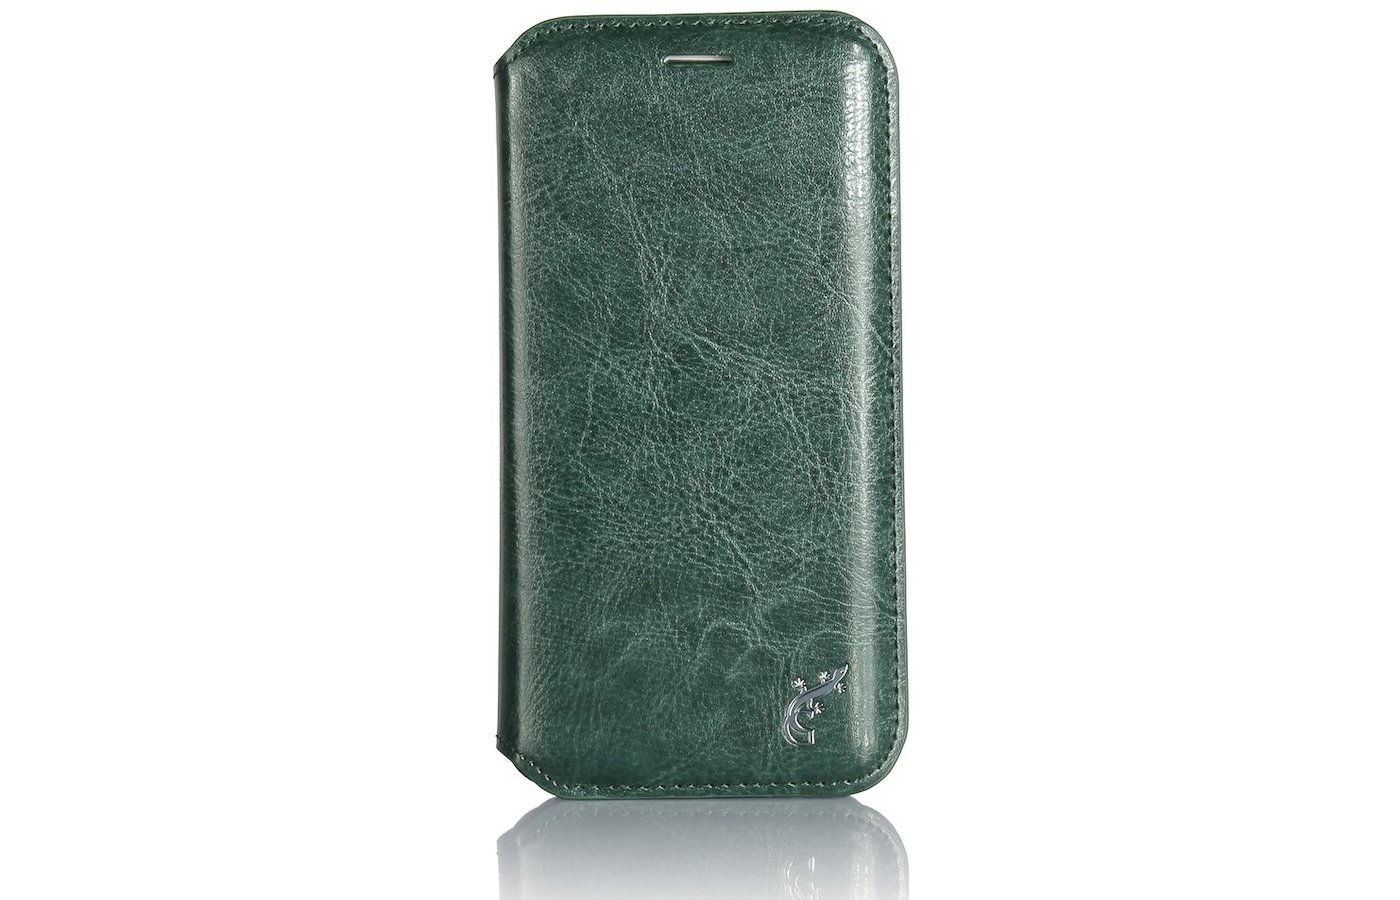 Чехол G-Case для Samsung Galaxy S6 Edge (SM-G925) темно-зелёный